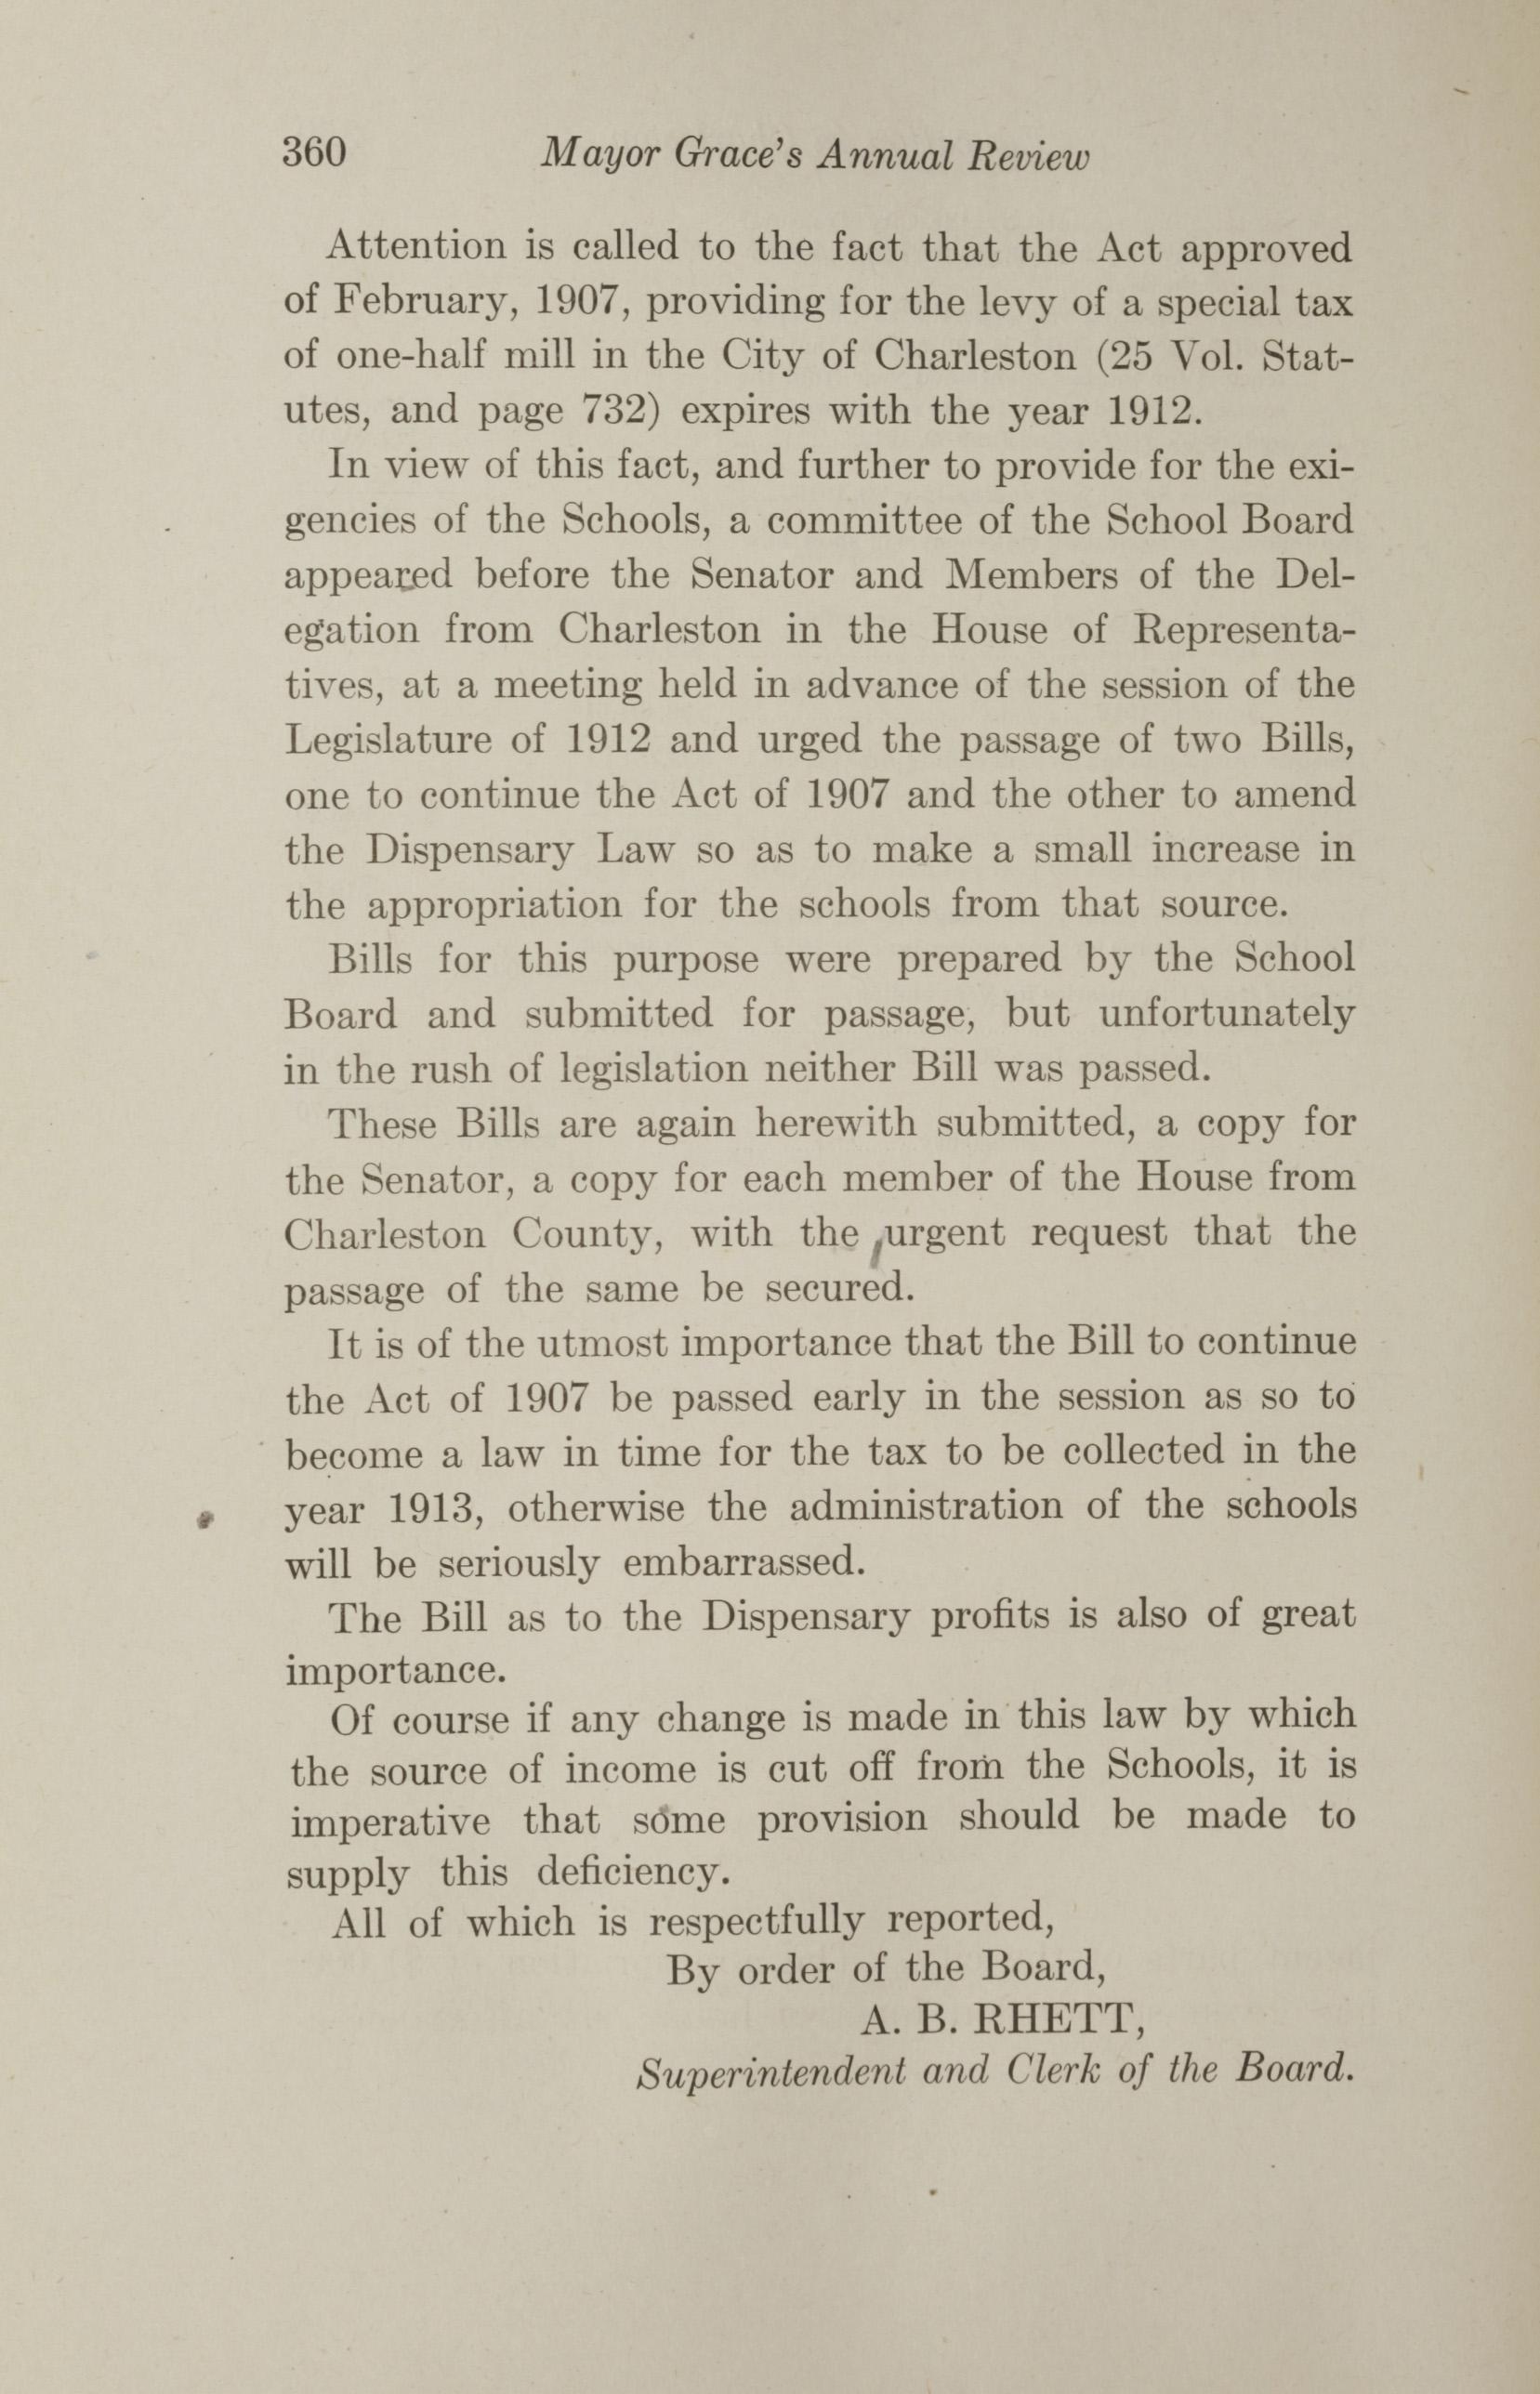 Charleston Yearbook, 1912, page 360